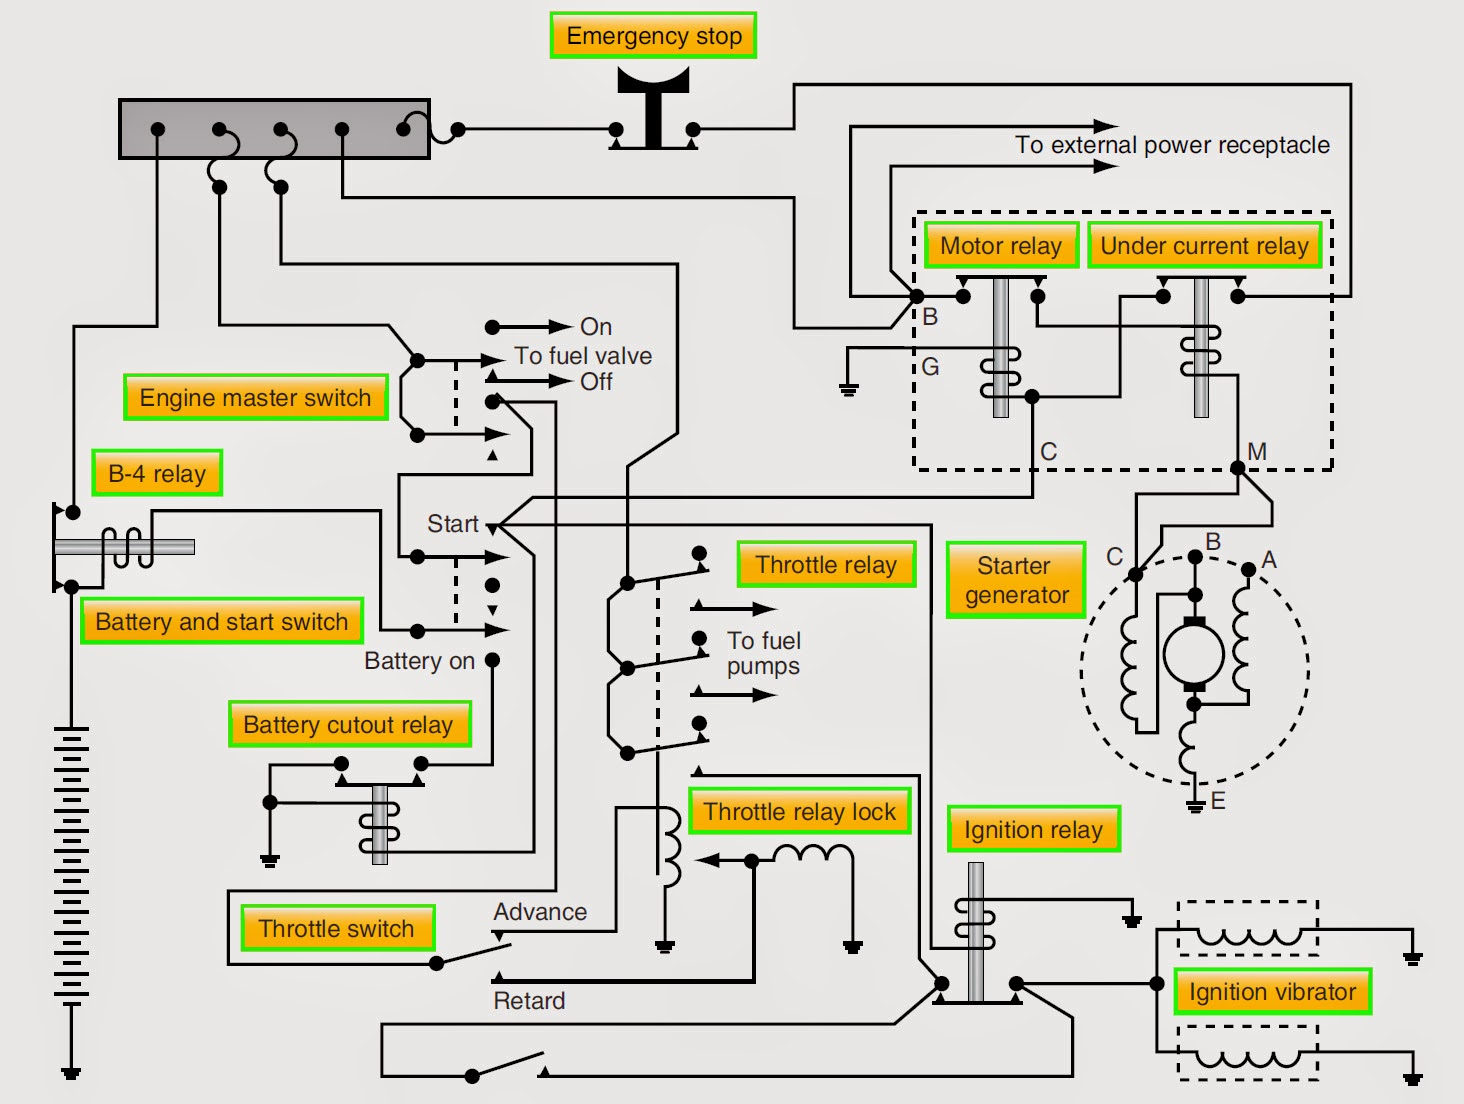 rv automatic transfer switch wiring diagram platypus venn old onan generators diagrams kohler generator ~ odicis